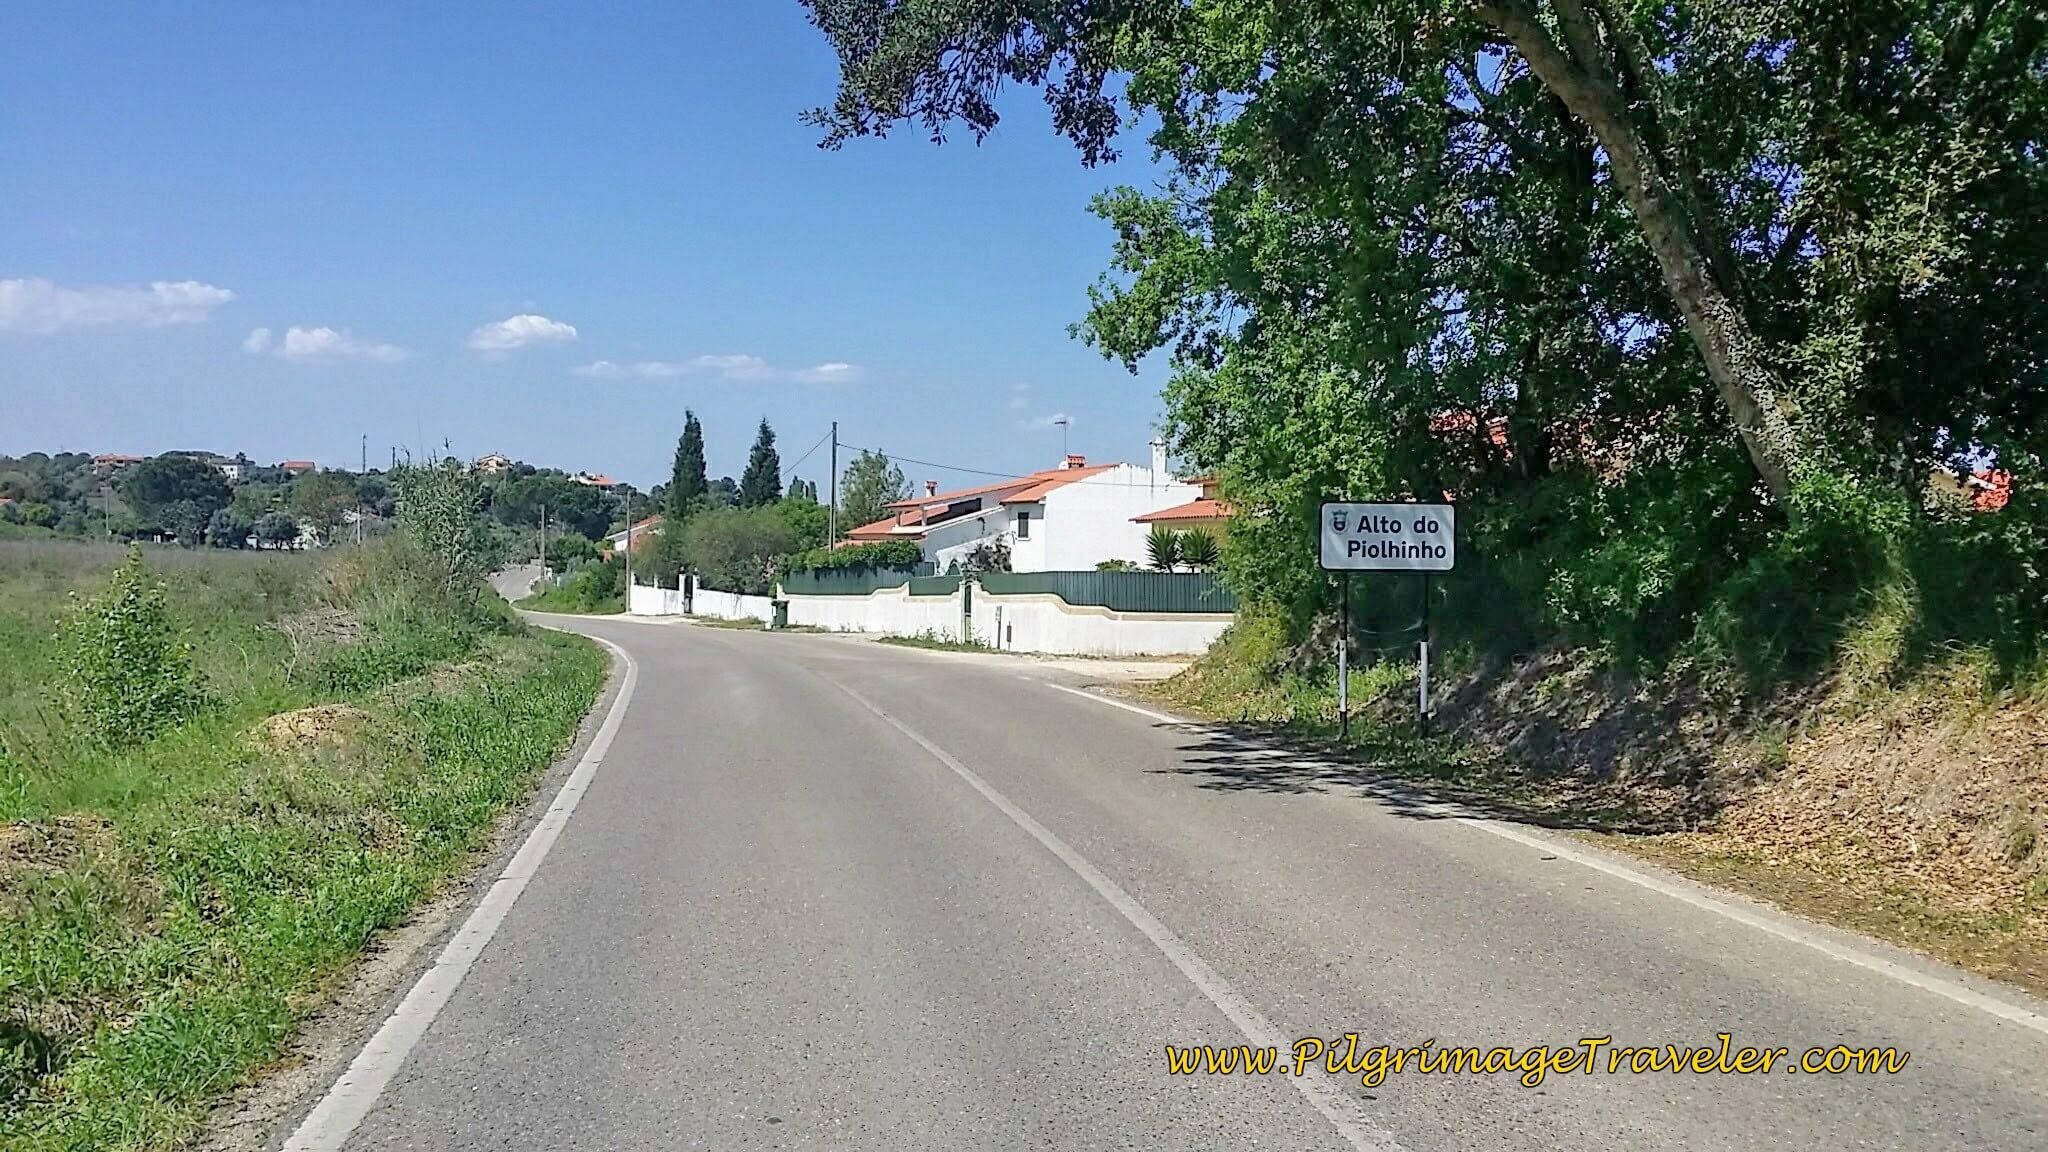 Entering Alto do Piolinho on the Portuguese Way, day five.